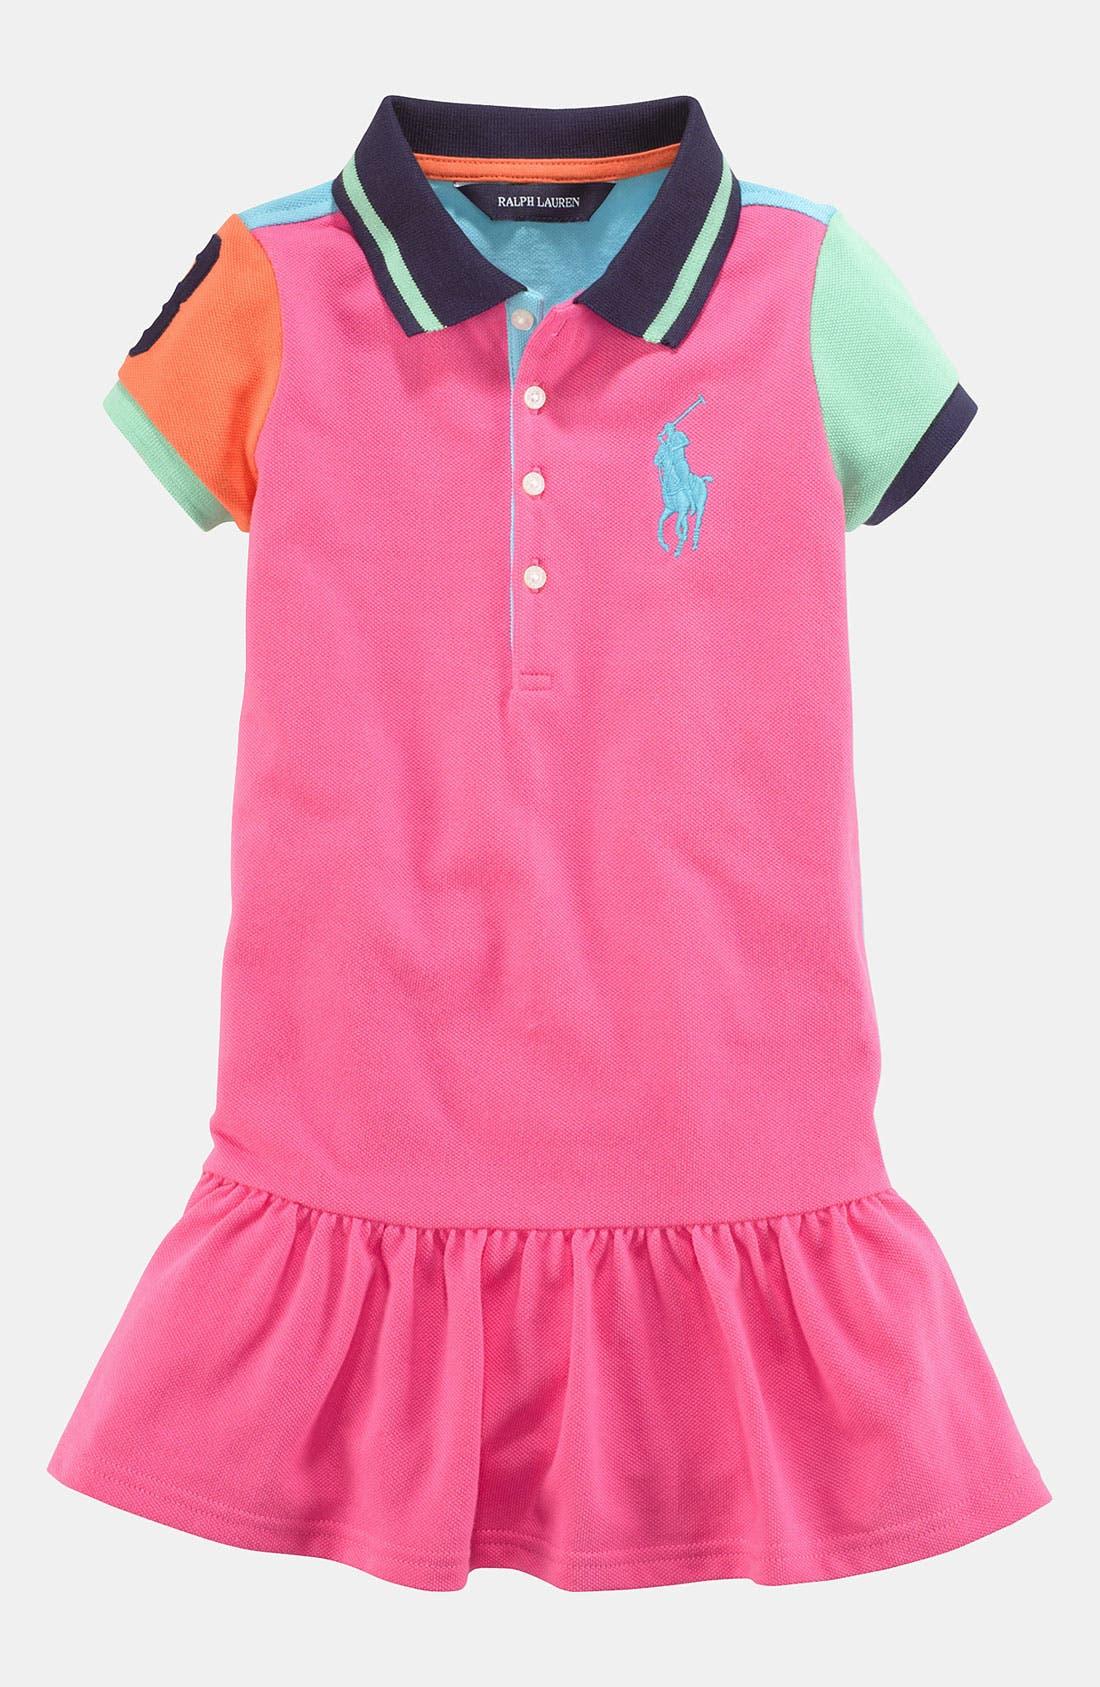 Main Image - Ralph Lauren Colorblock Polo Dress (Toddler)